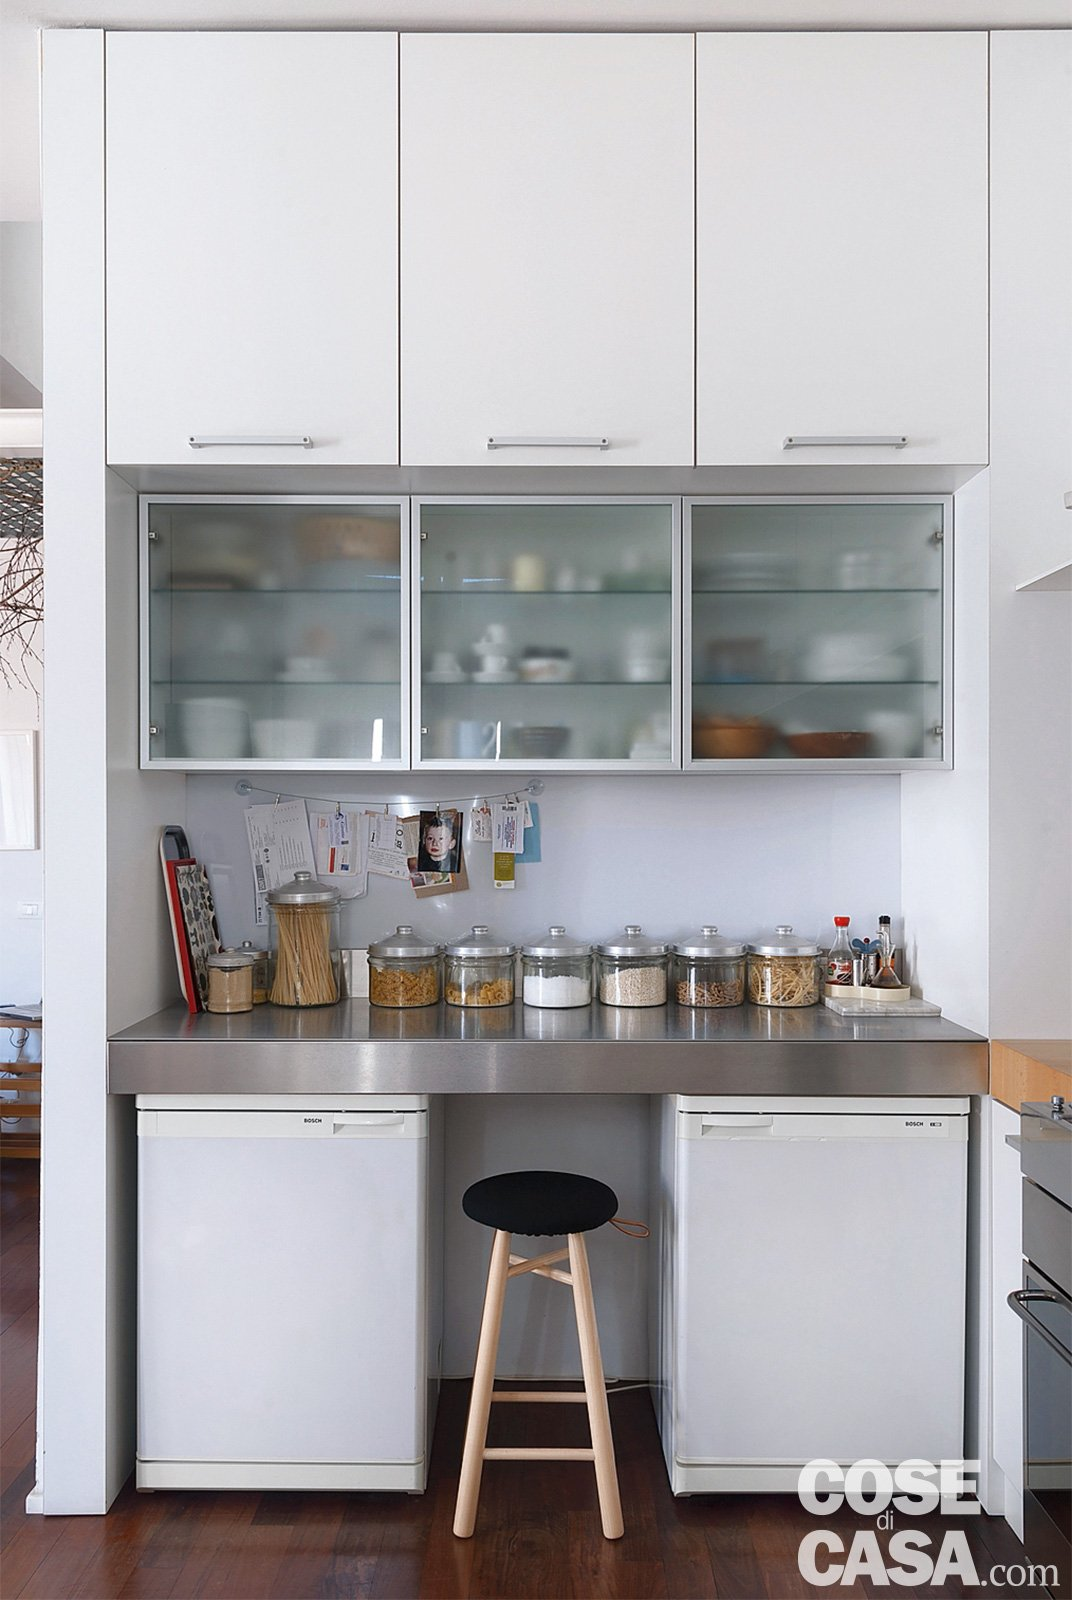 Cucina frigorifero cose di casa - Cucina con soppalco ...